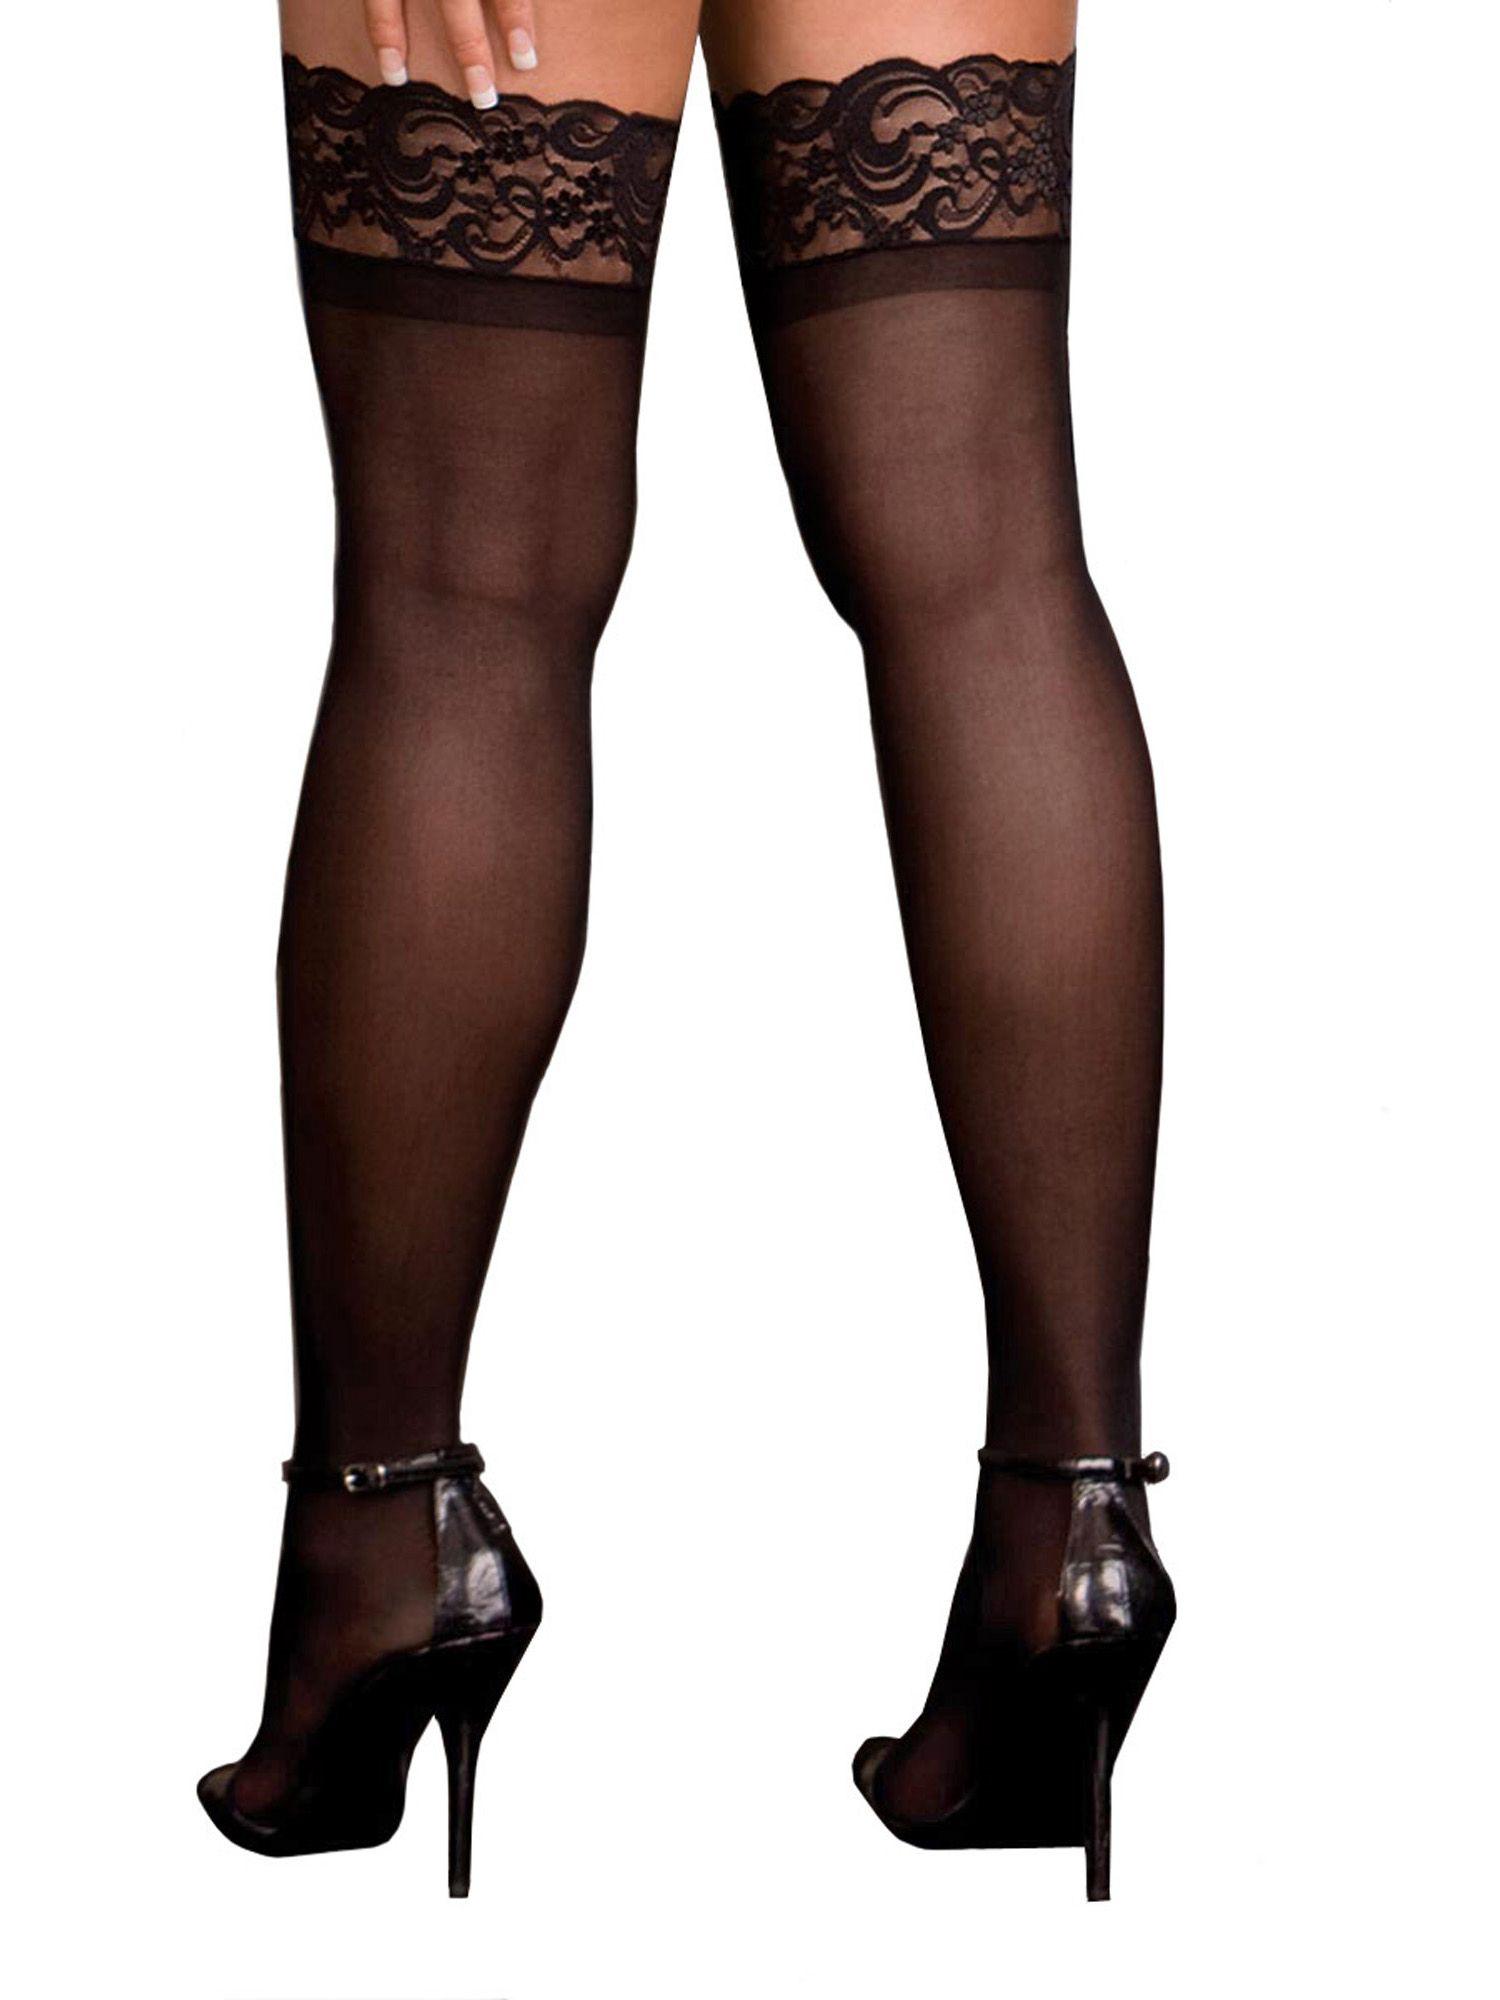 ef4931078 Plus Size Hosiery Lingerie Lace Top Sheer Thigh High Stocking- Fits size  16-22 Lace Top Sheer